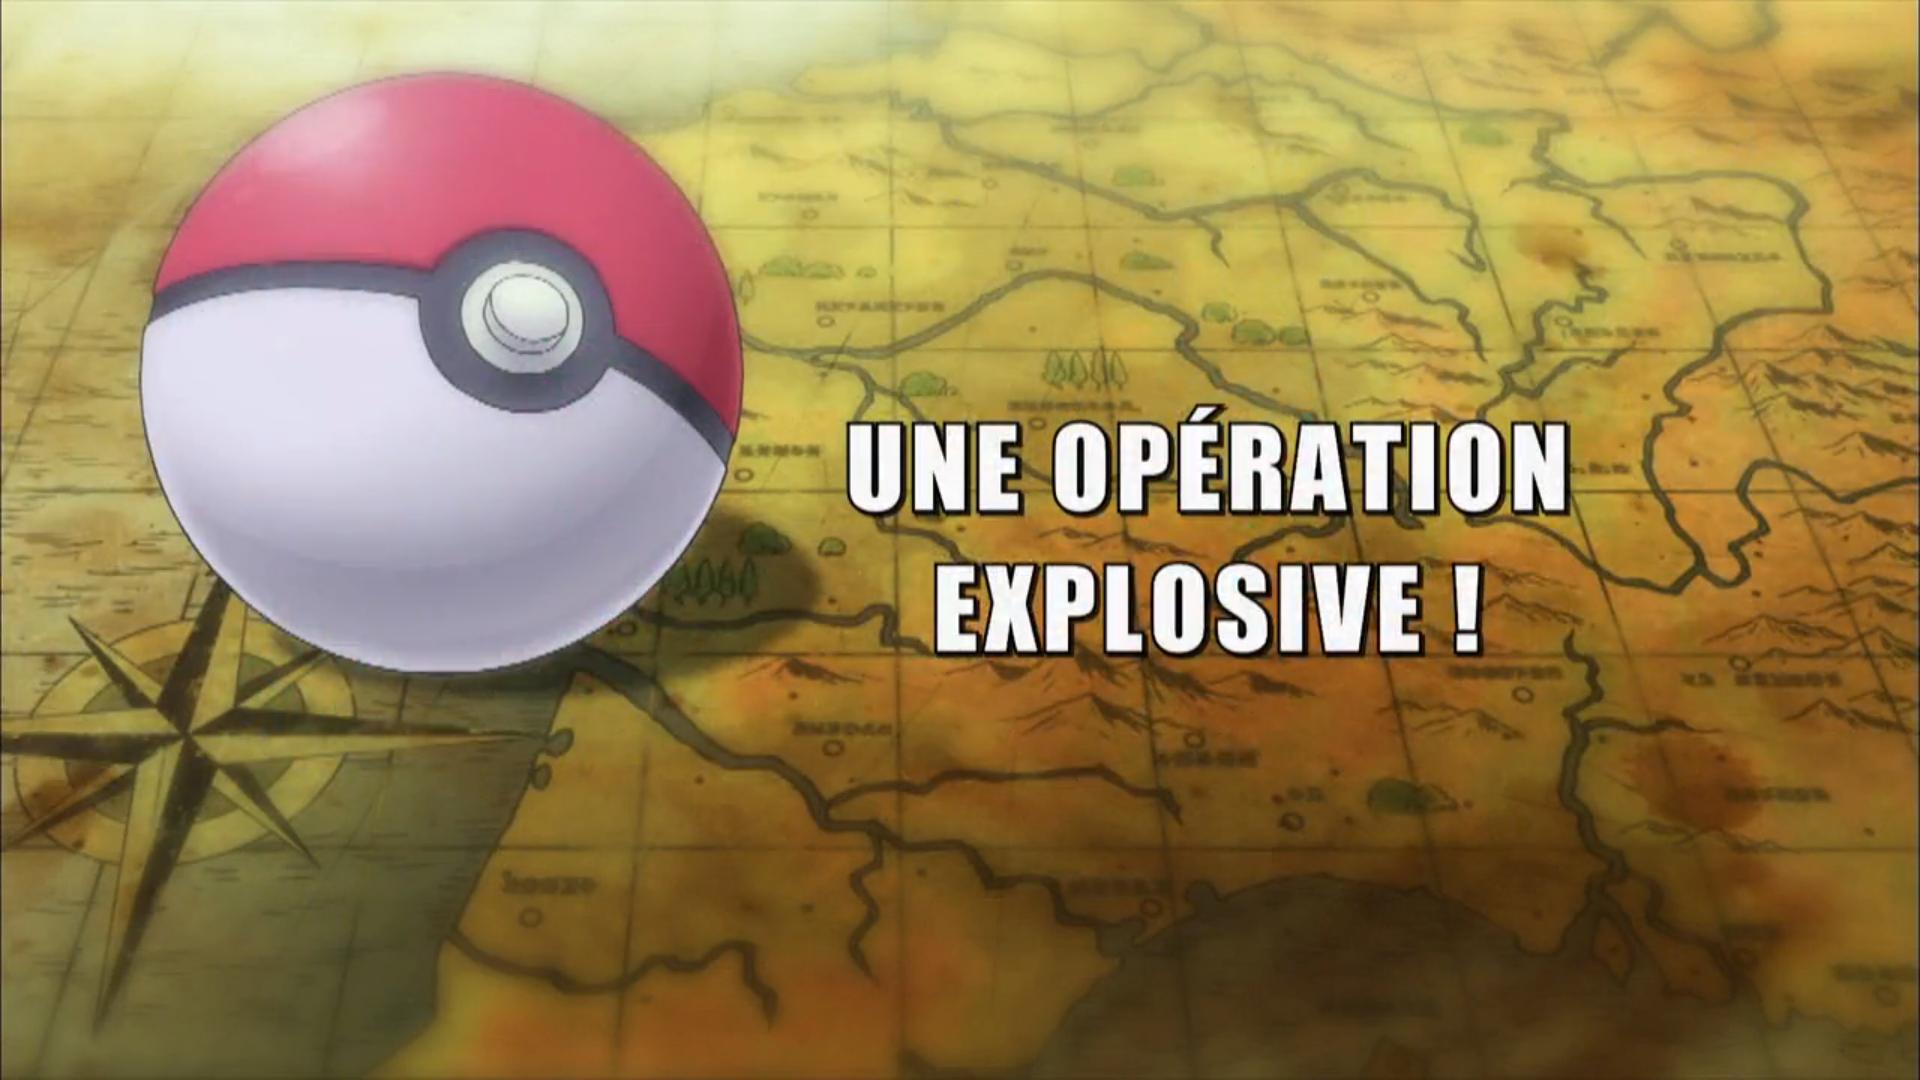 Pokémon - 19x14 - Une opération explosive !